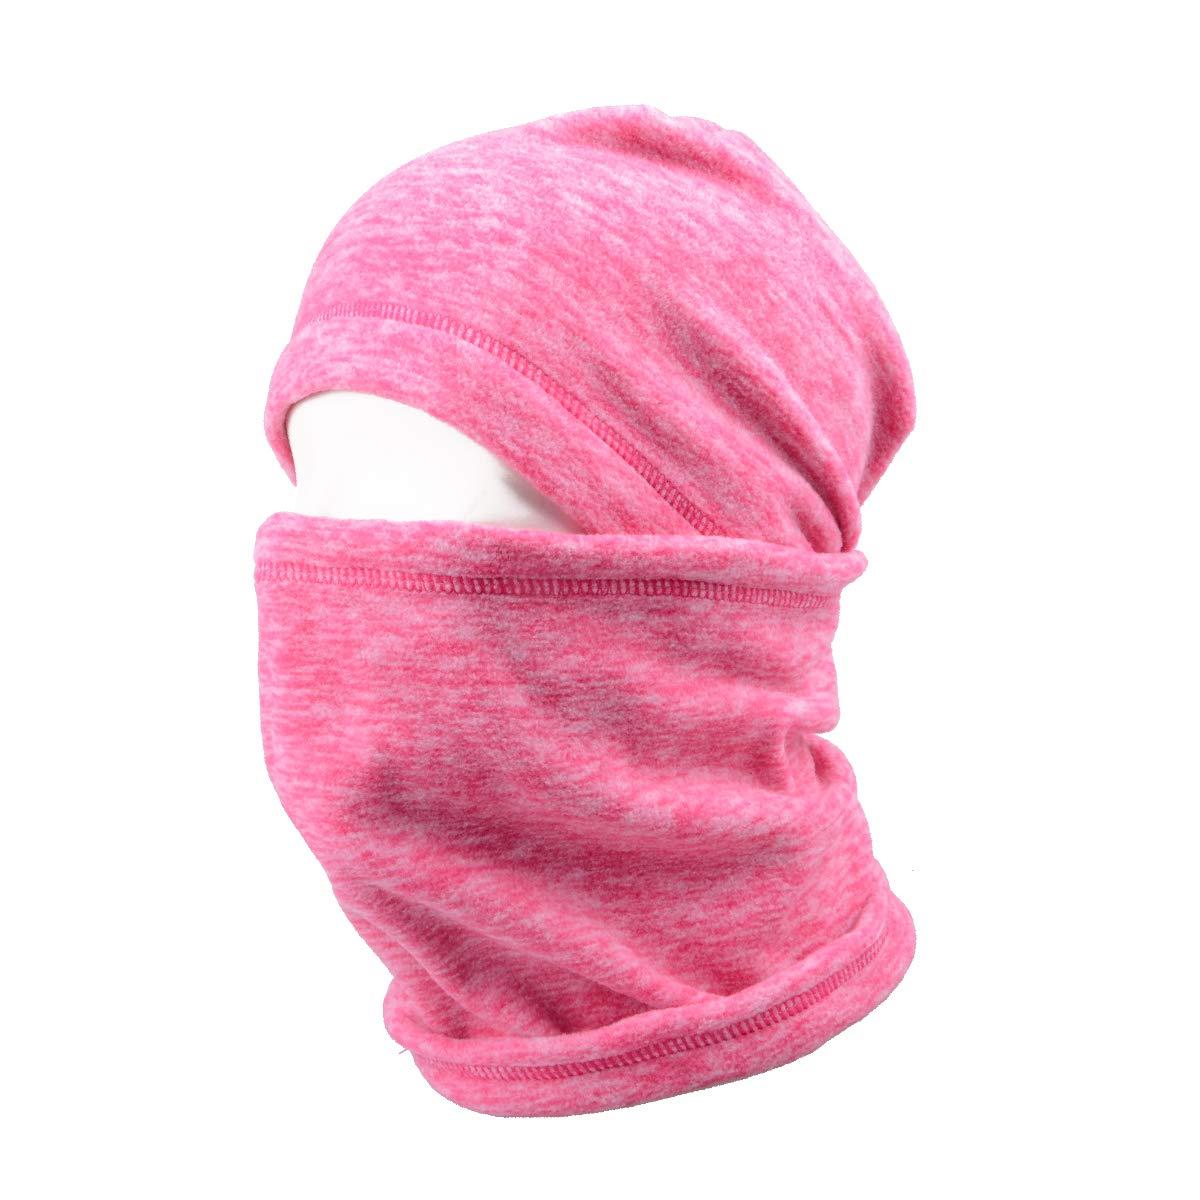 Triwonder Pasamonta/ñas Sombrero de campana Sombrero polar t/érmico M/áscara facial Cuello calentador Invierno M/áscara de esqu/í Cubierta de rostro completo Cap